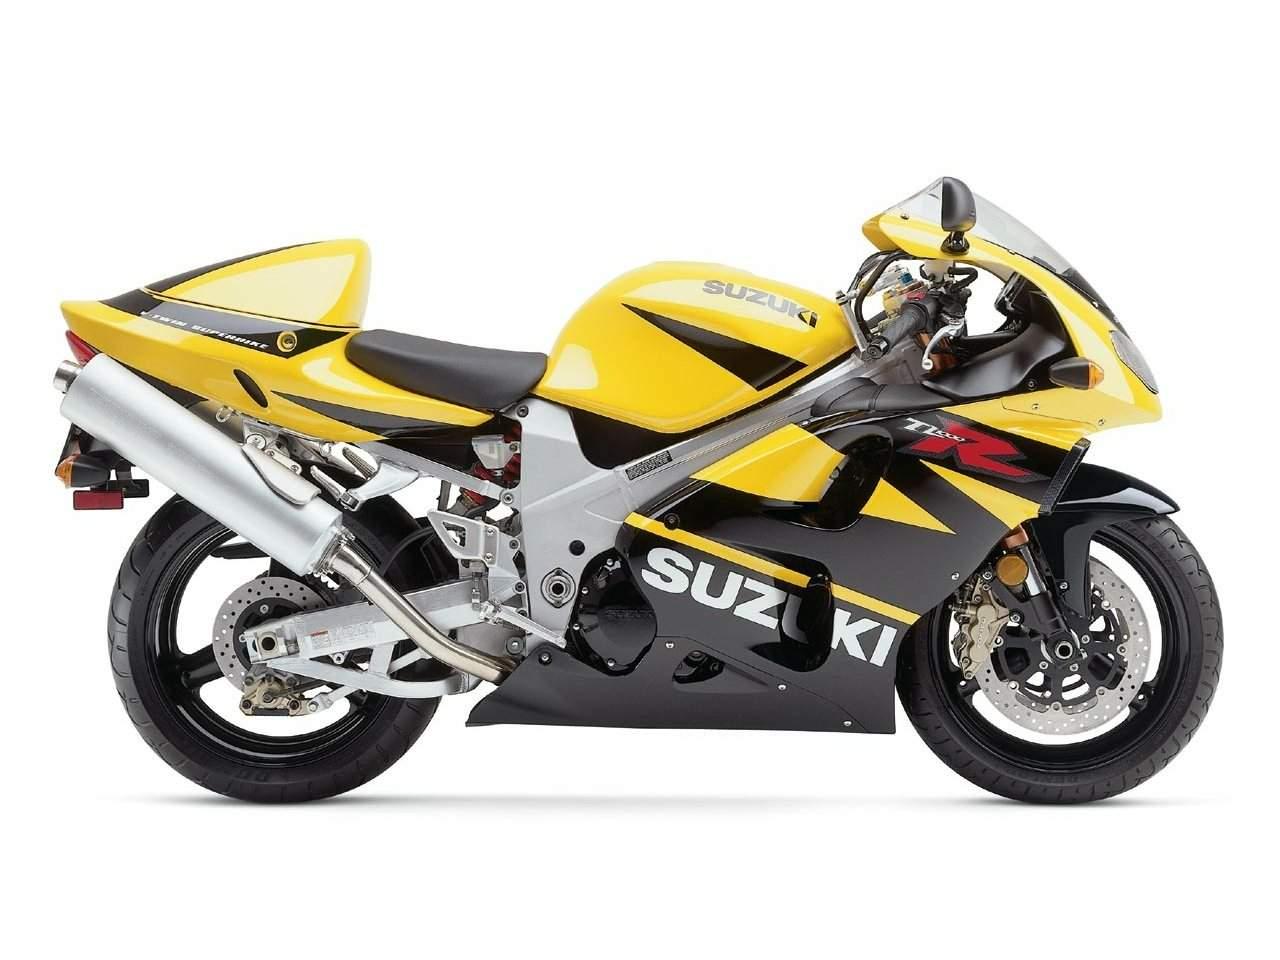 1998 Suzuki TL1000R - Bike-urious